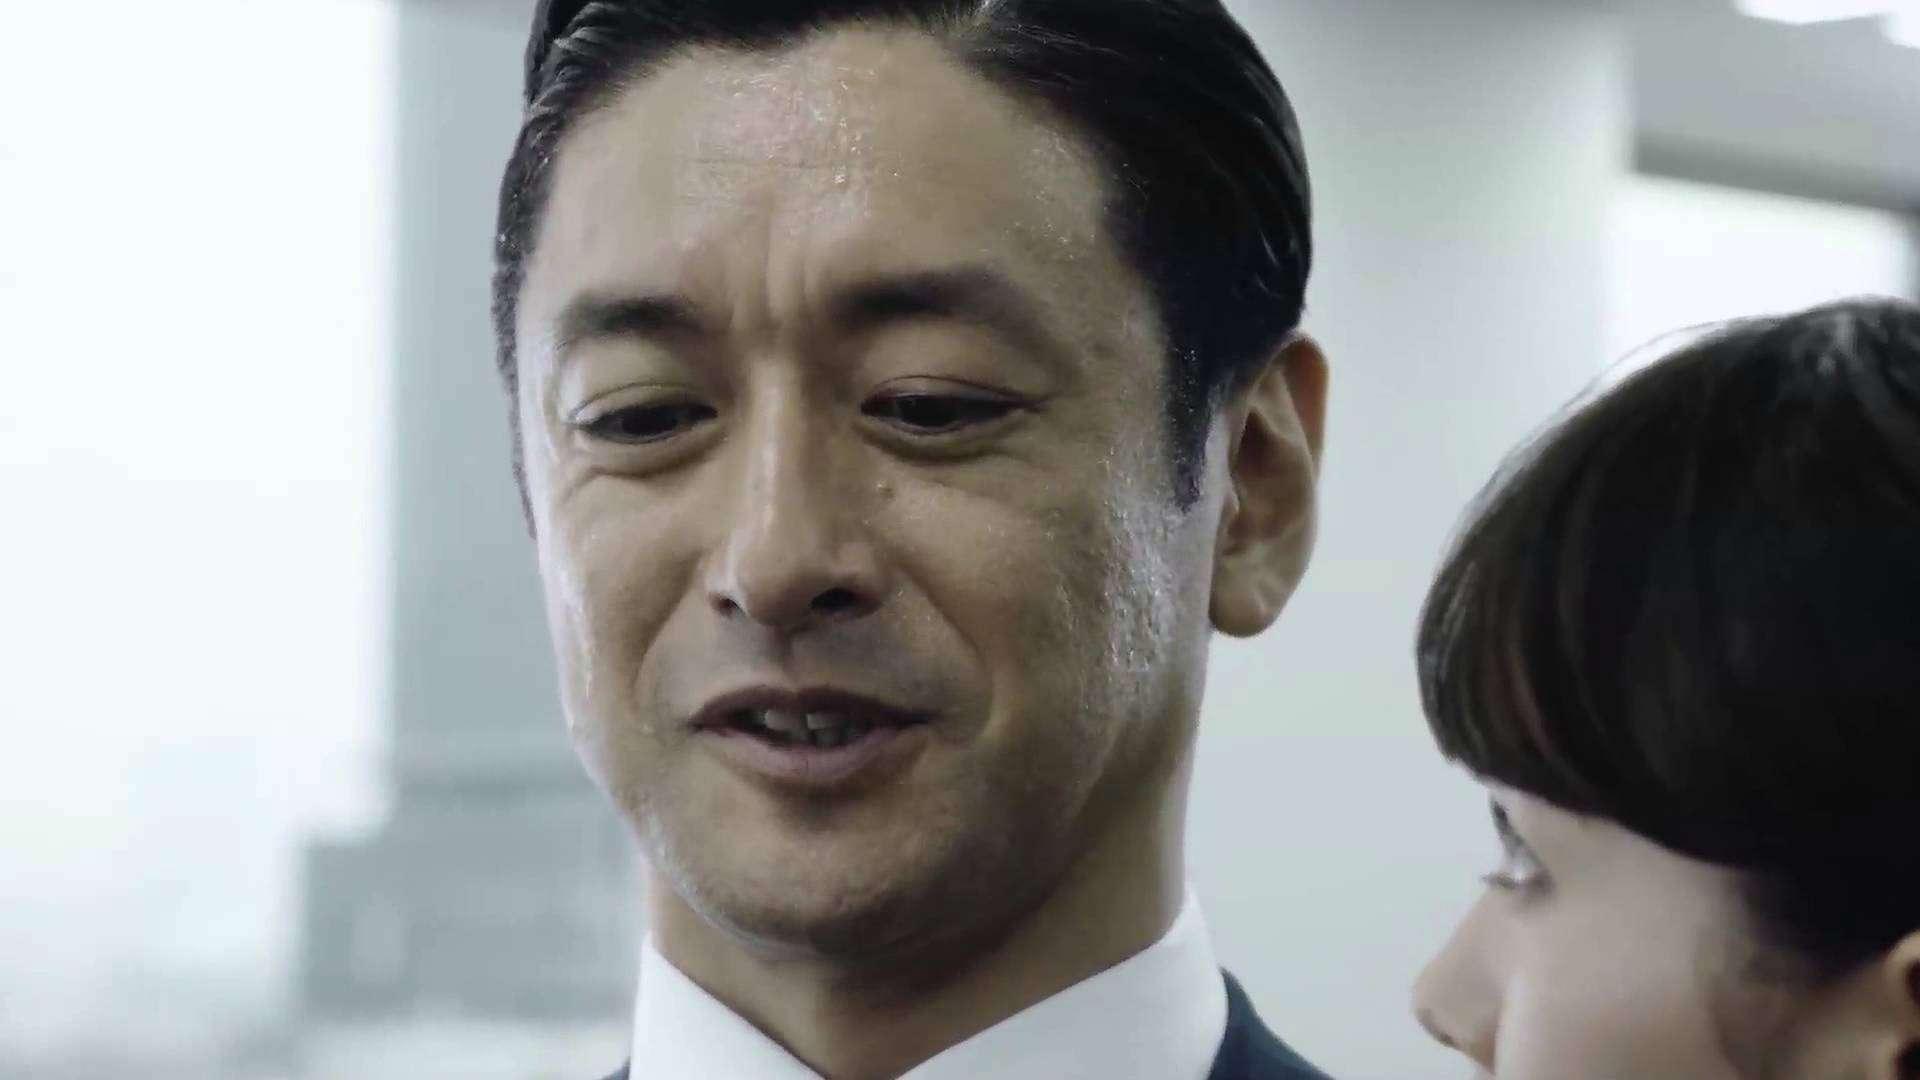 PIXUS 桐谷美玲 CM 「猫好き桐谷さん/スマフォトプリント篇」30秒 【キヤノン公式】 - YouTube